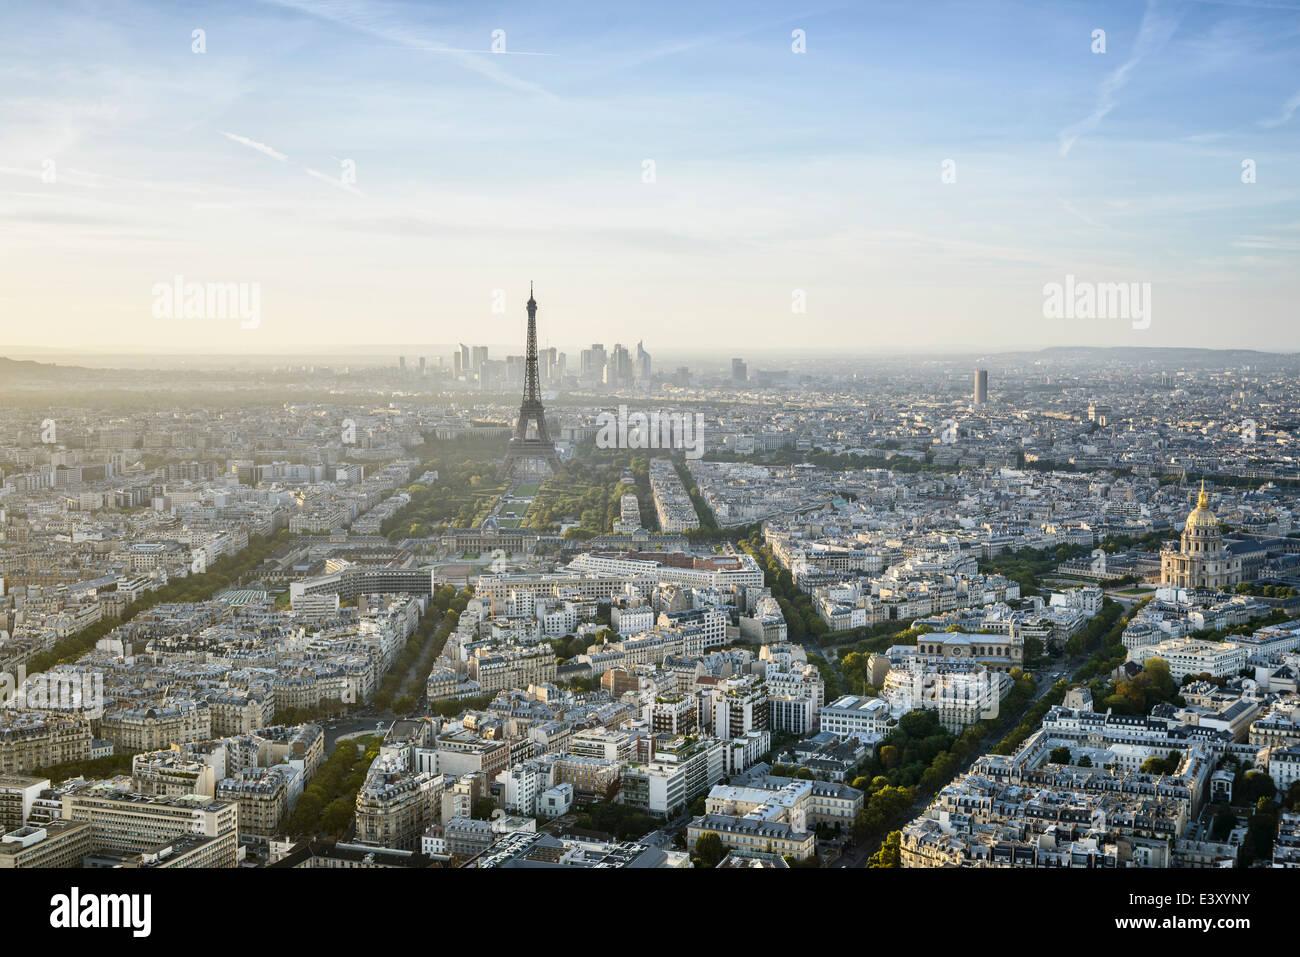 Vista aerea del paesaggio urbano di Parigi, Parigi, Ile de France, Francia Immagini Stock